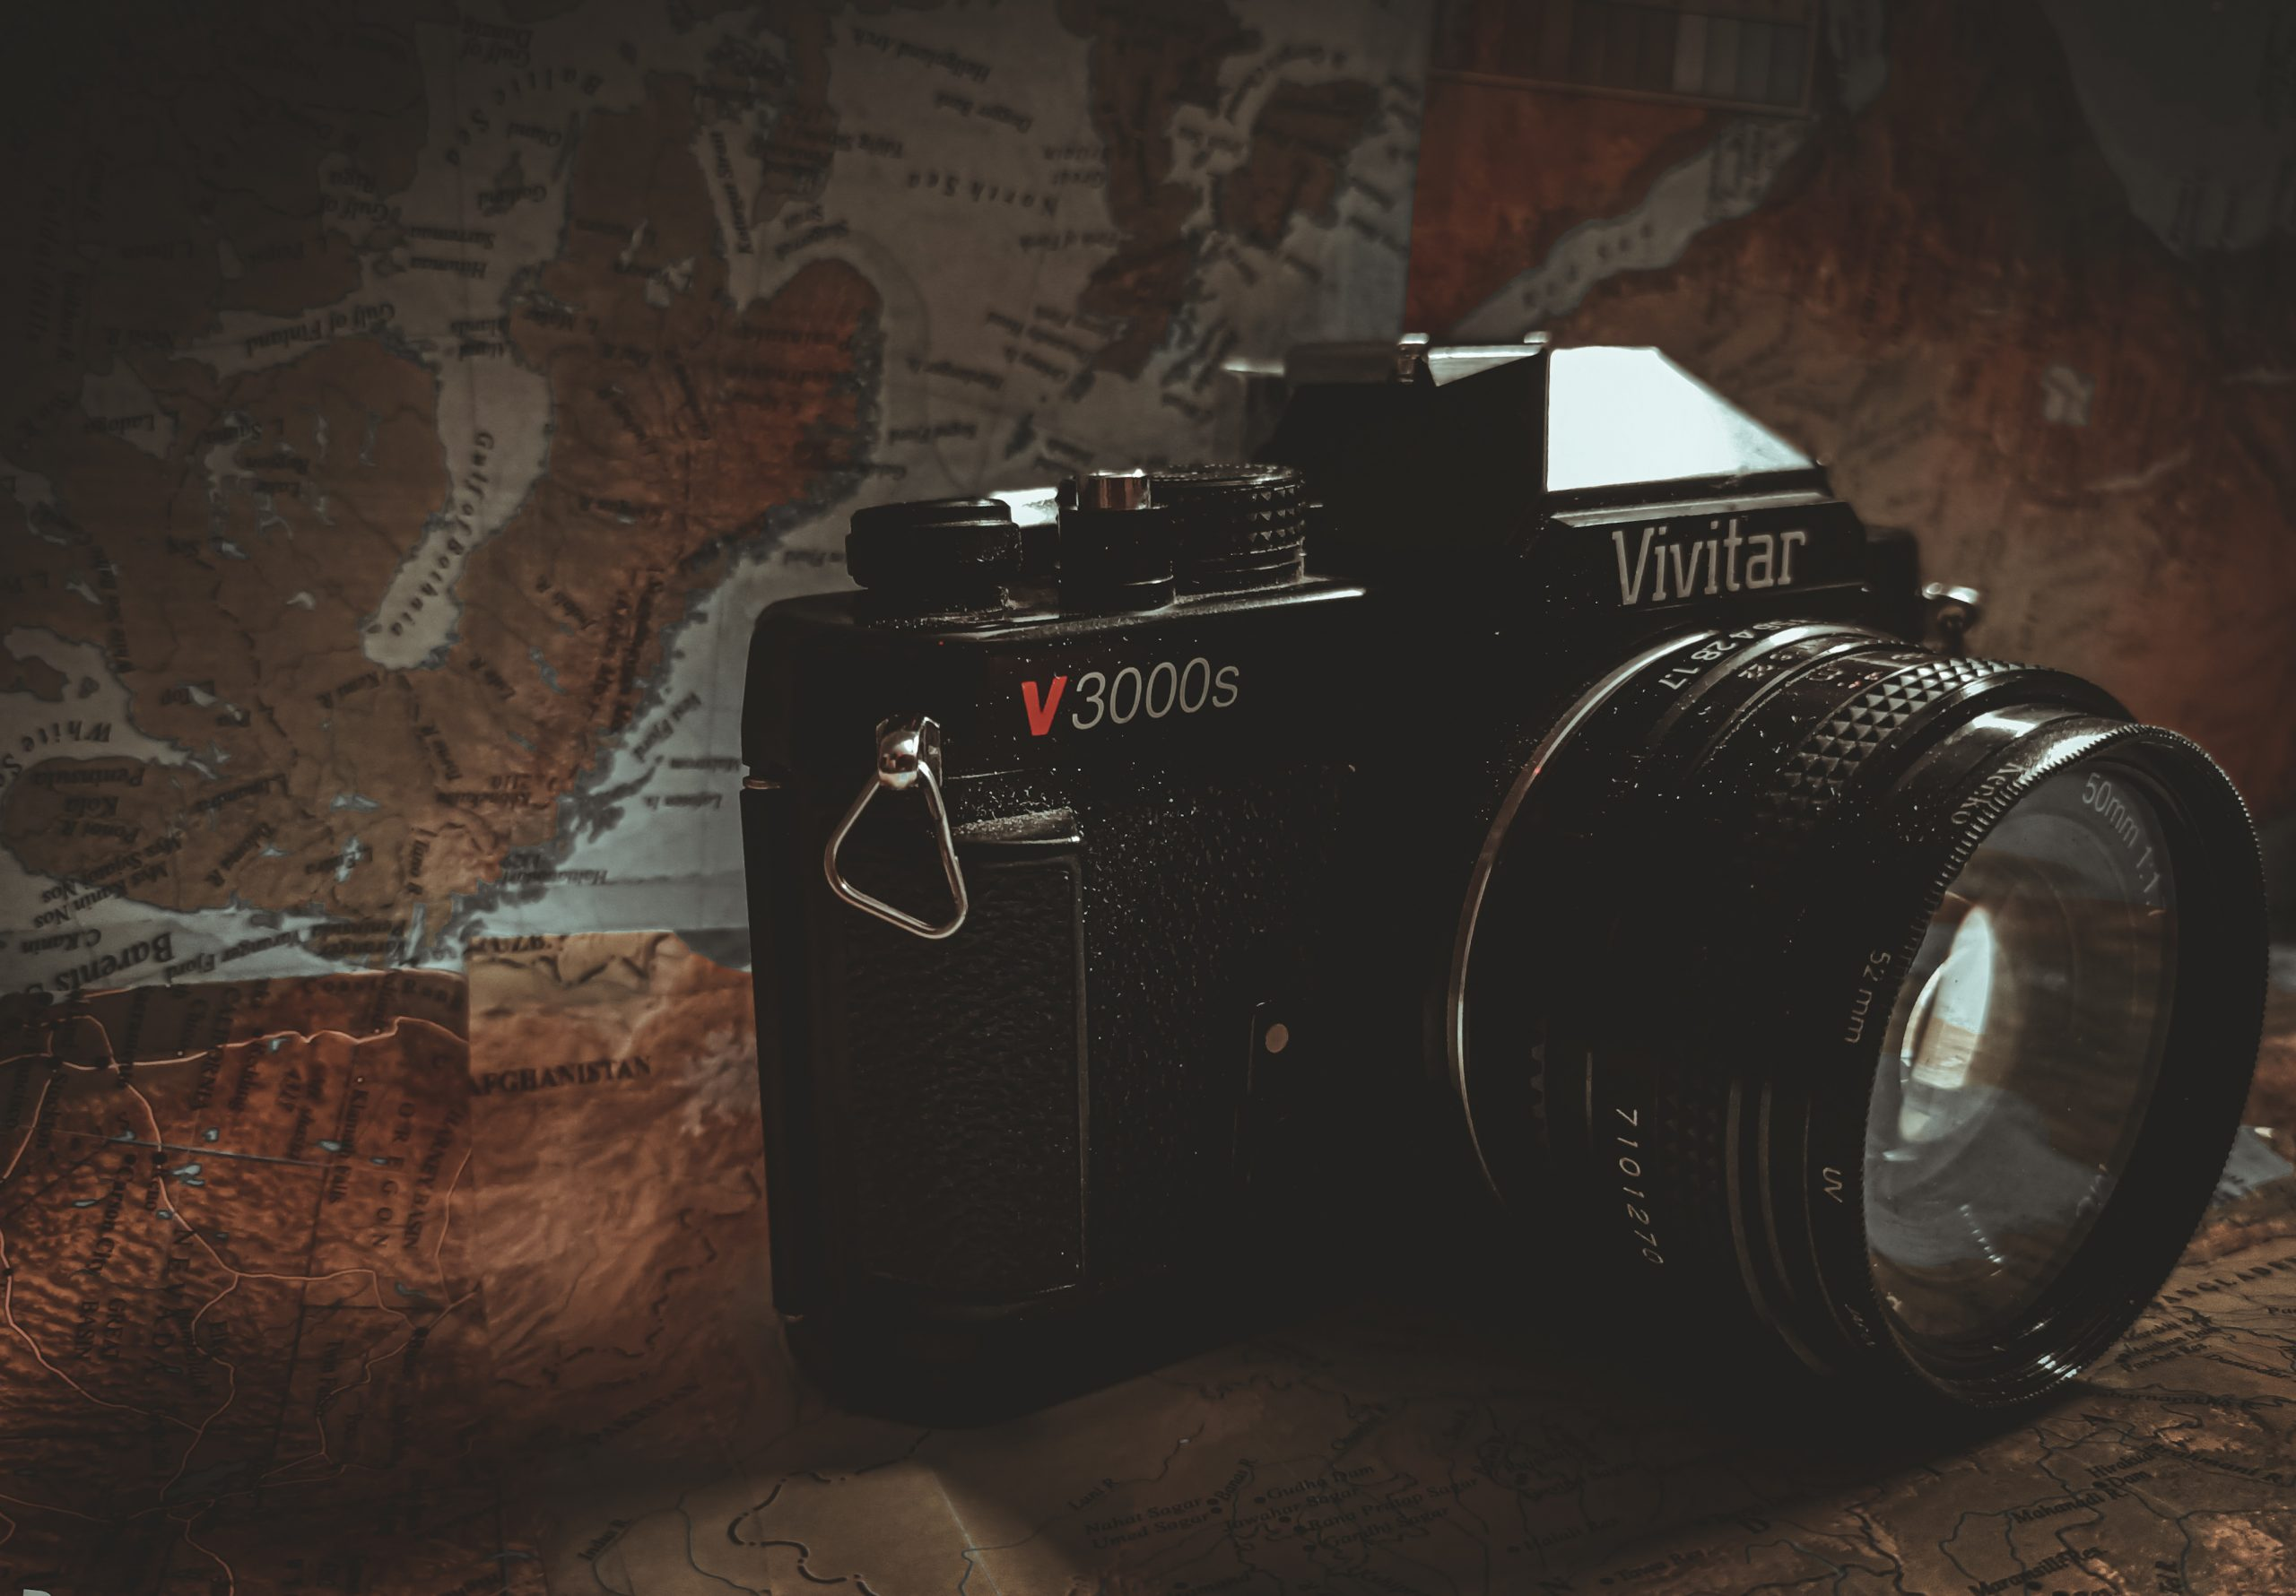 A photography camera